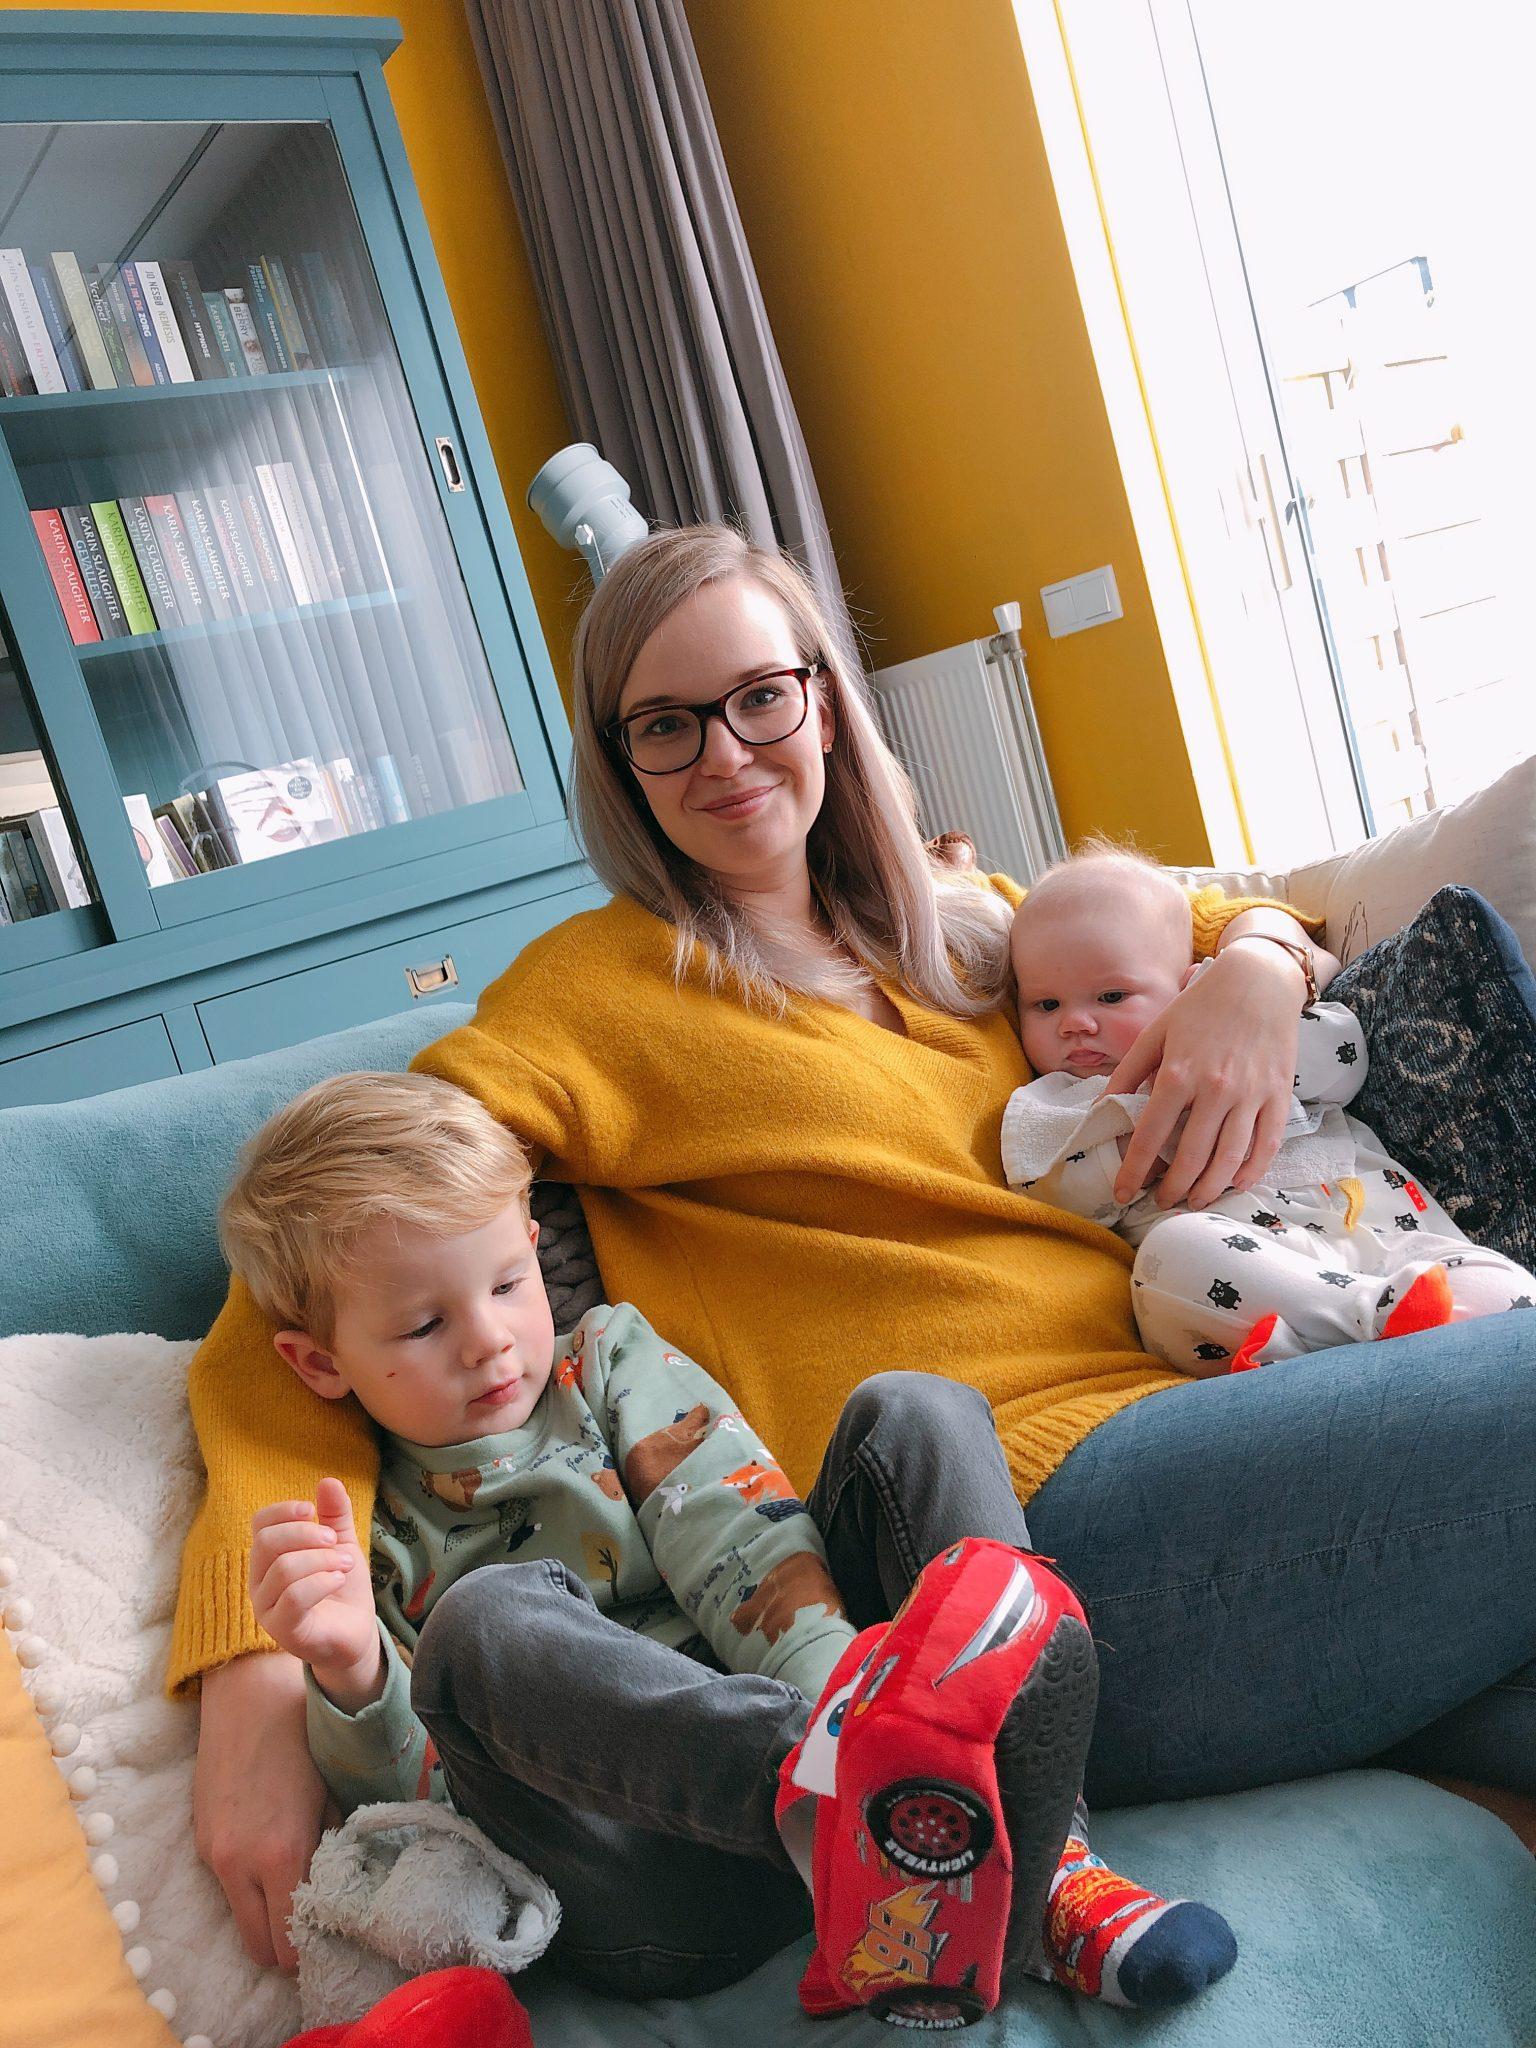 Elise's Weekly Pictorama - Huis, tuin & keuken bezigheden